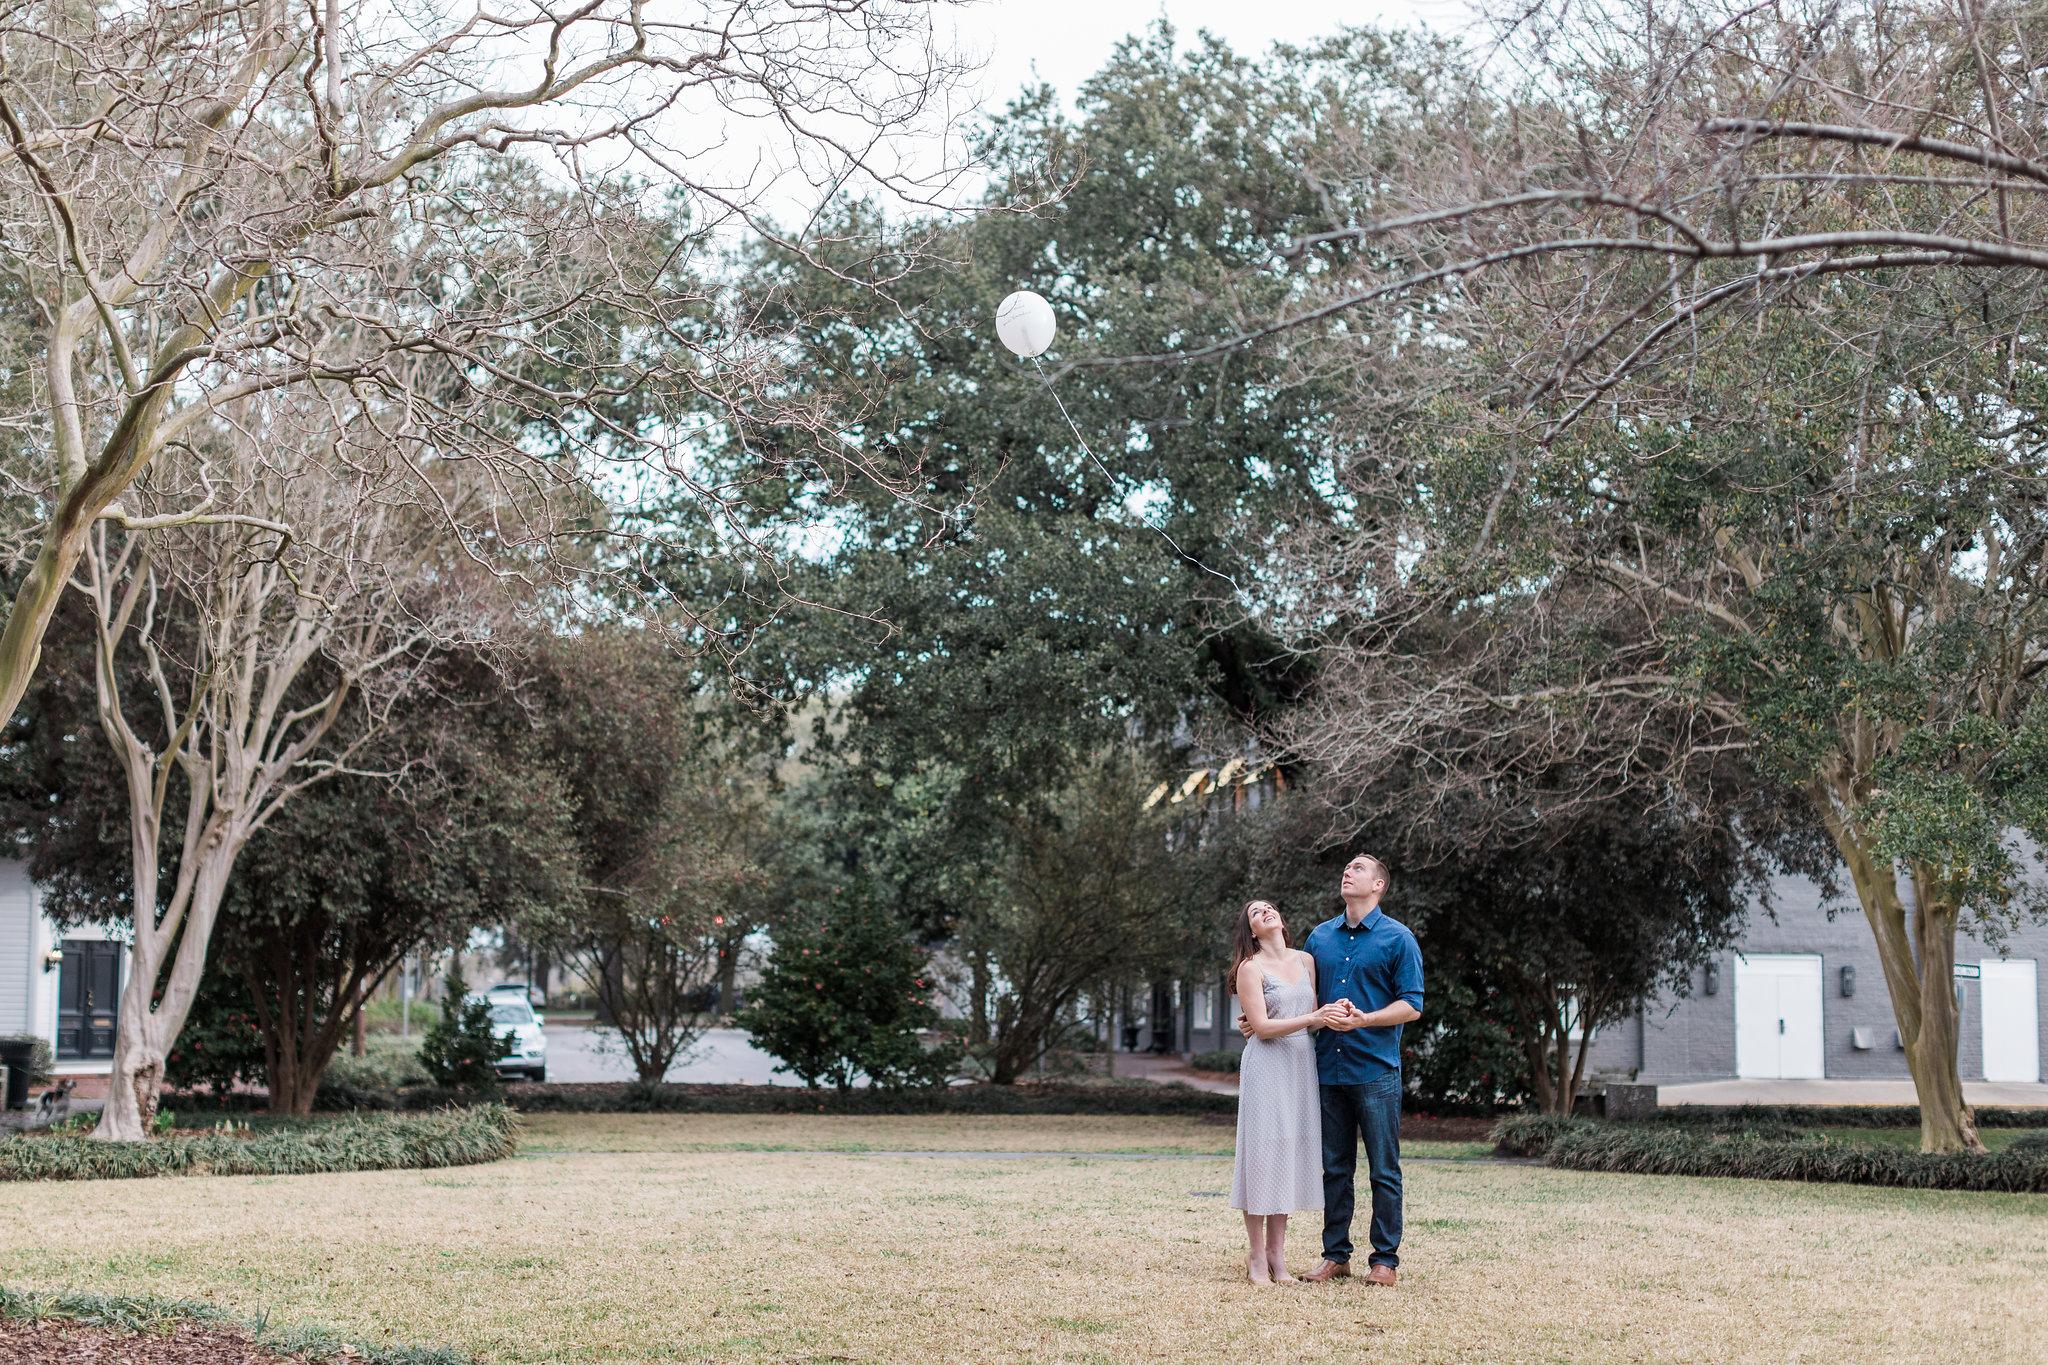 apt-b-photography-ansley-dj-memorial-shoot-savannah-wedding-photographer-lifestyle-portrait-photographer-washington-square-savannah-balloon-release-16.jpg